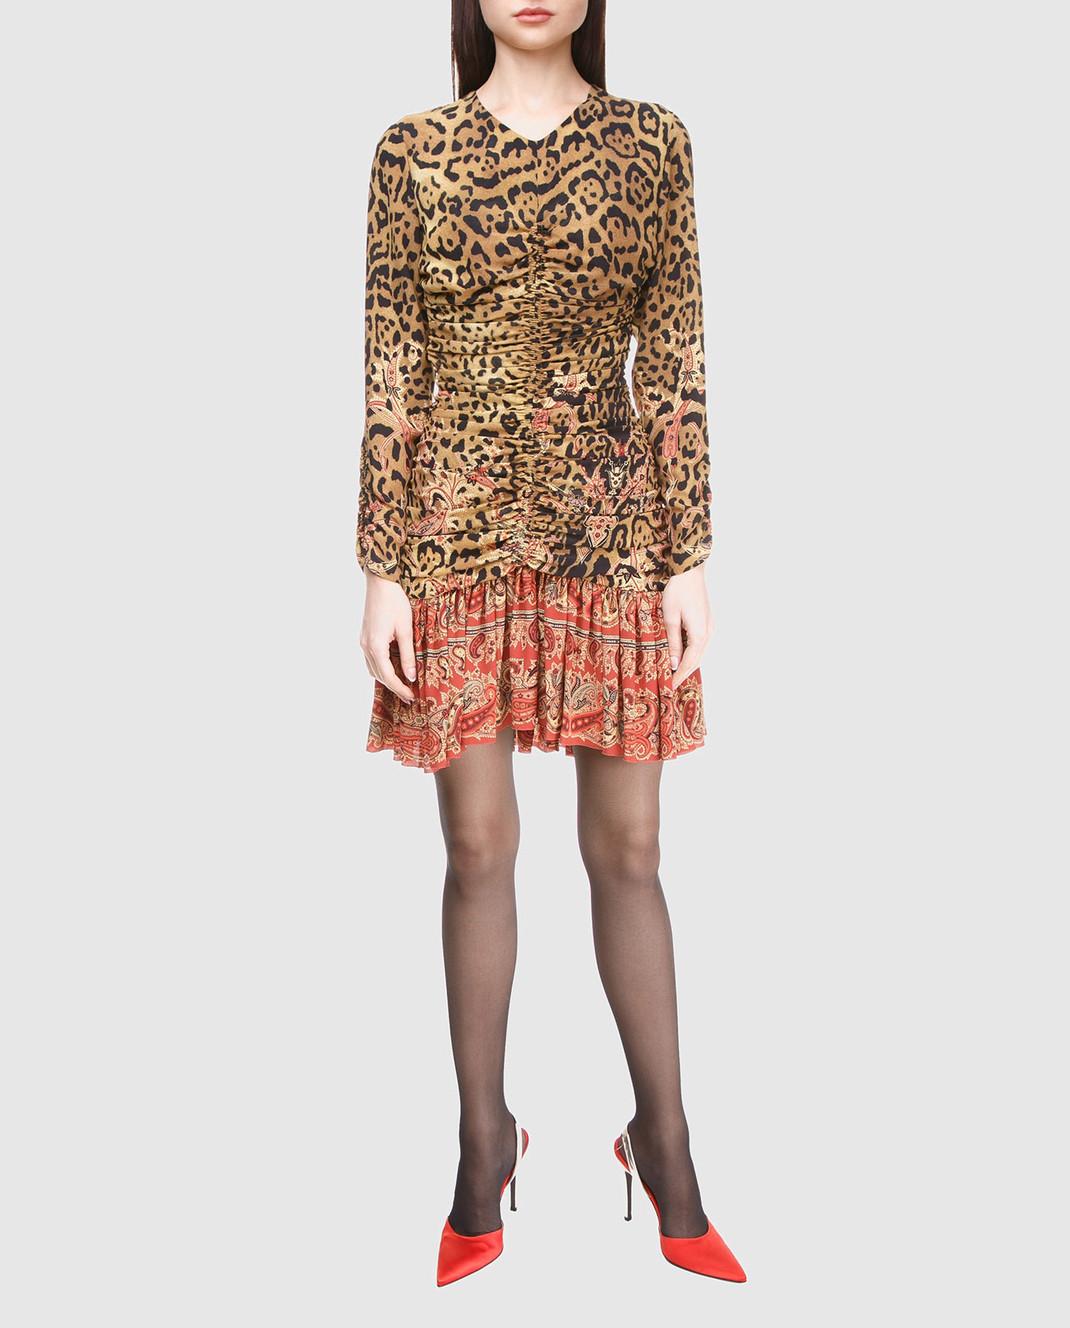 Etro Бежевое платье из шелка D152335384 изображение 2